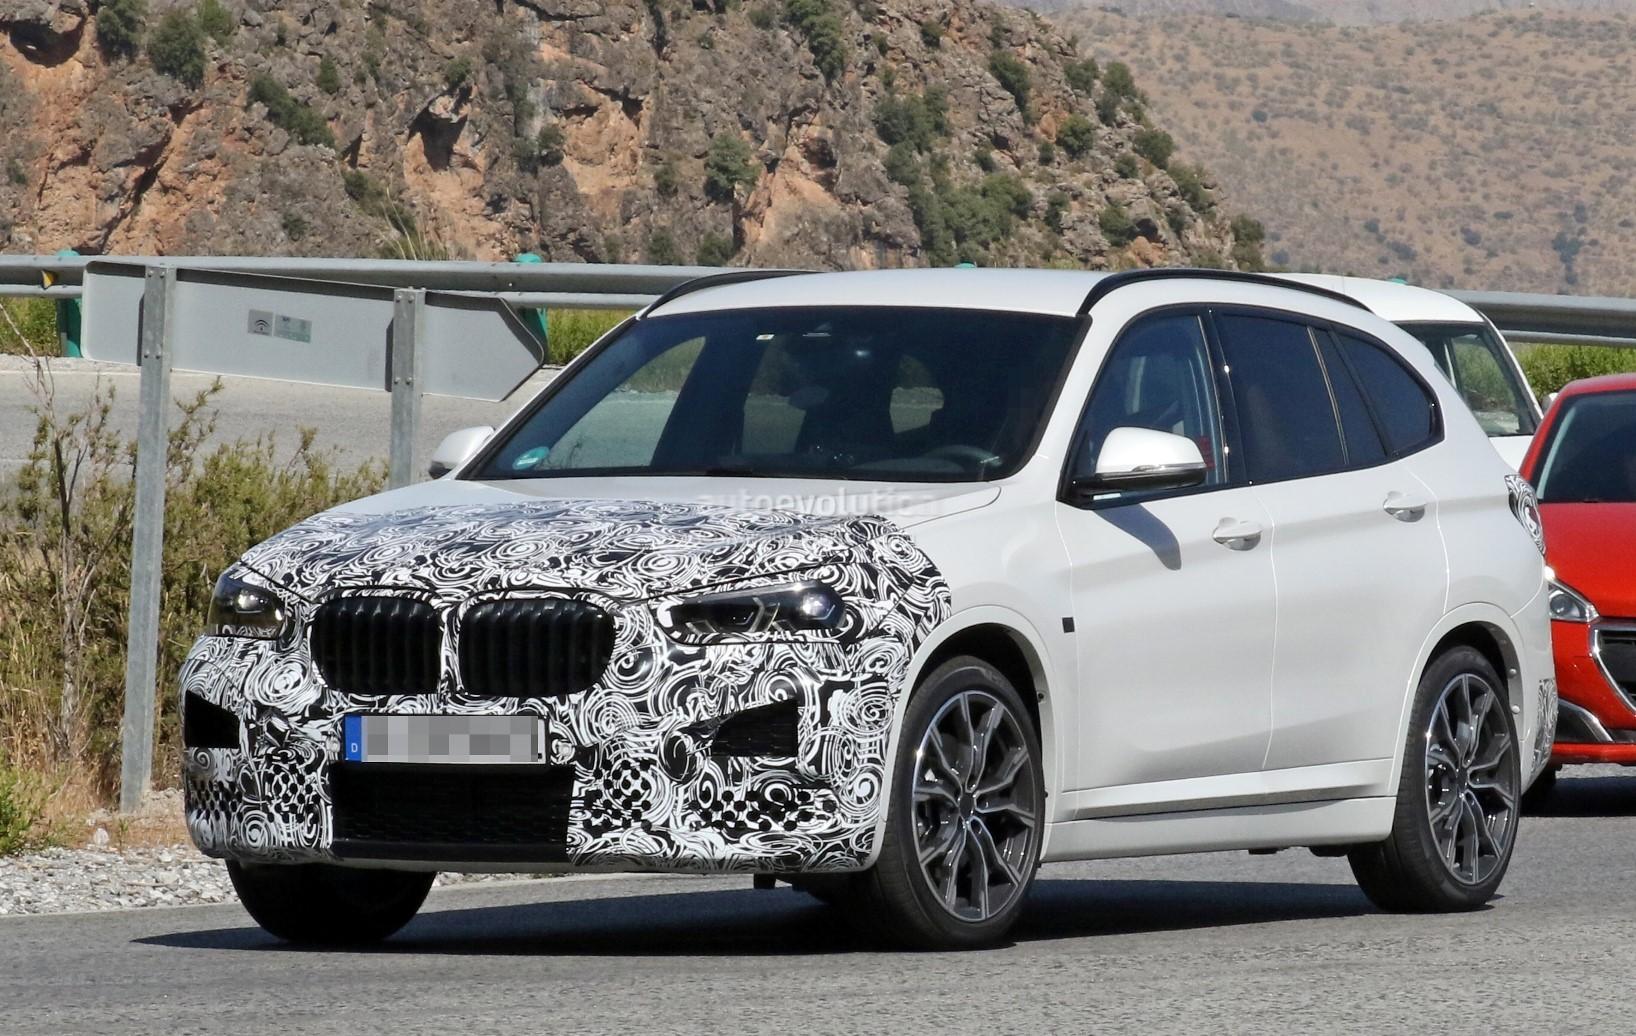 Mini Lci 2018 >> 2019 BMW X1 LCI Spied Hot-Weather Testing In Europe - autoevolution